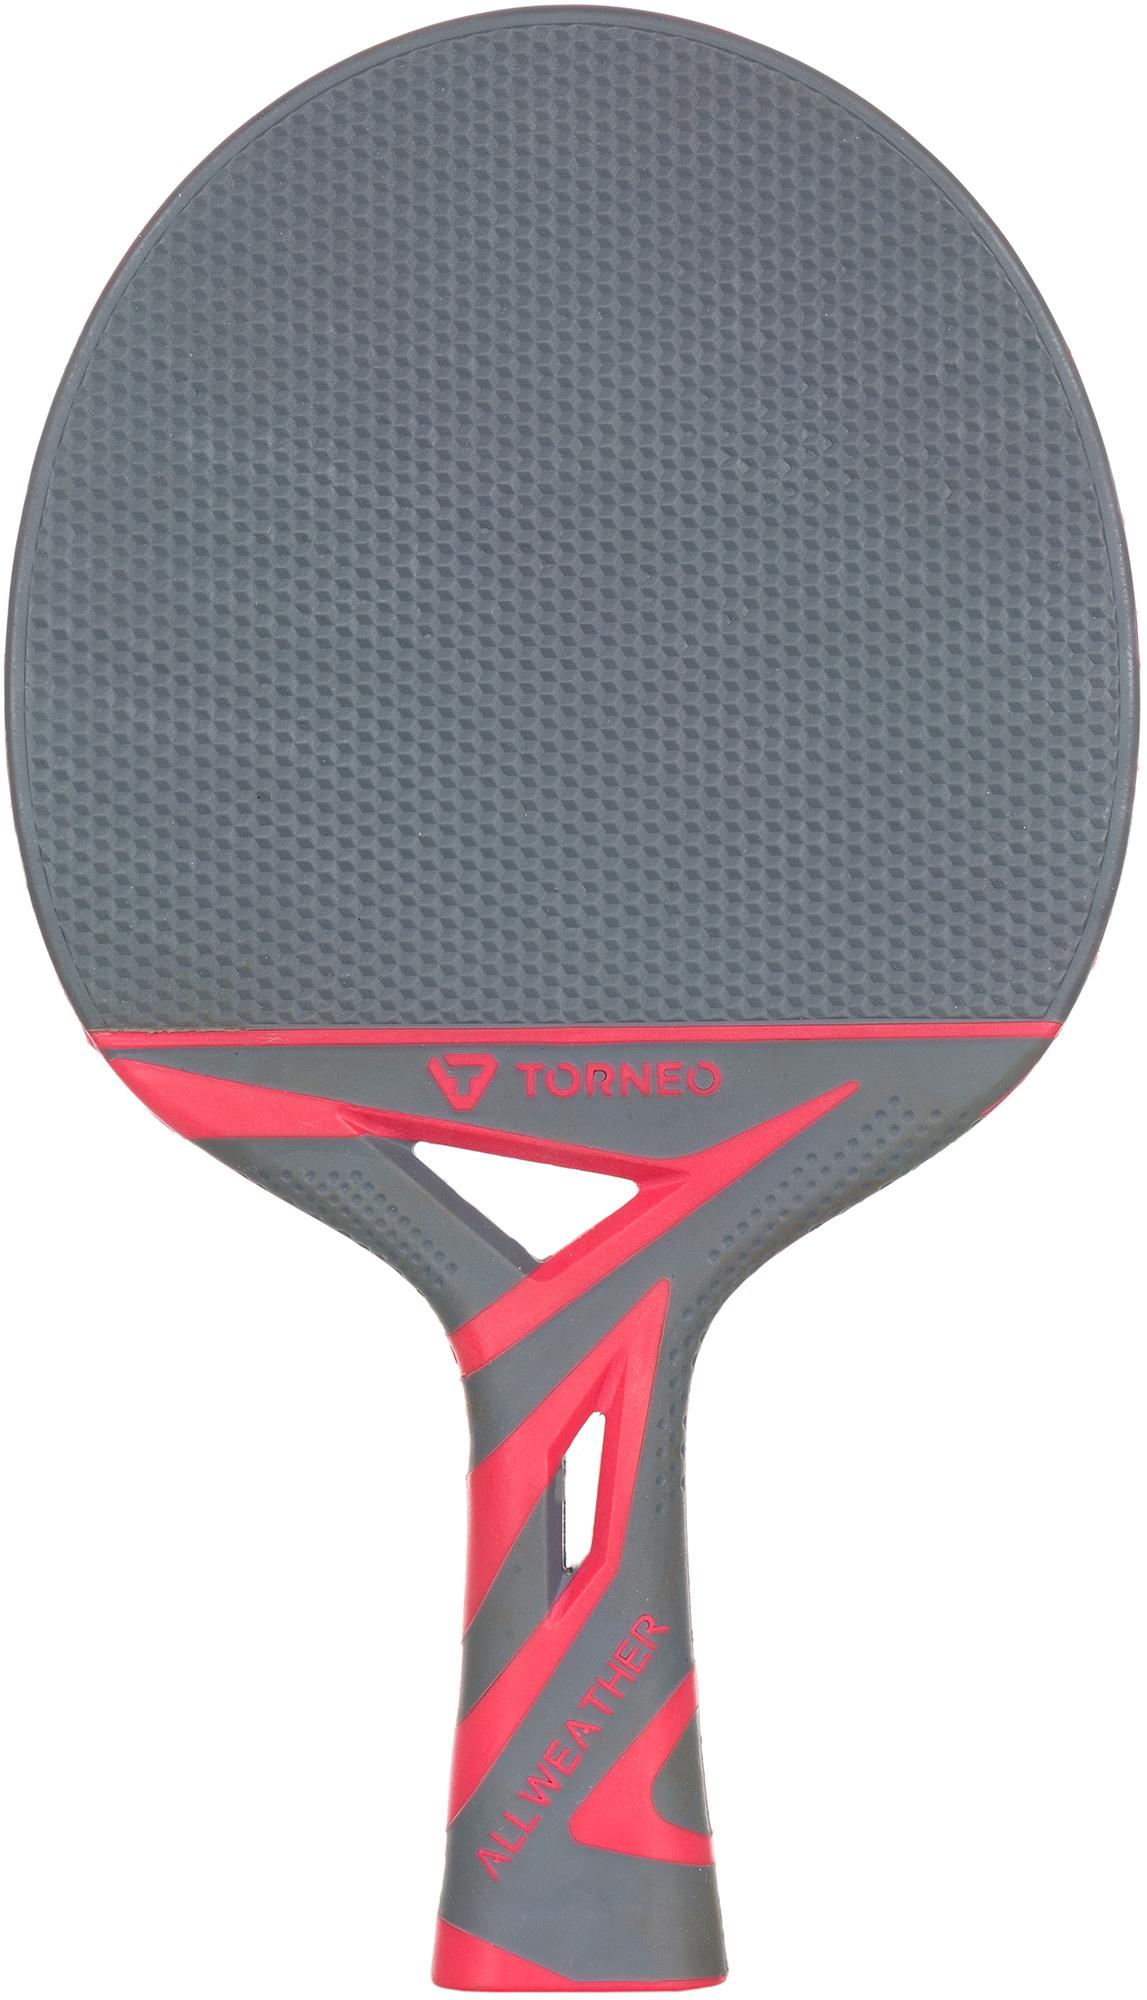 Torneo Ракетка для настольного тенниса Torneo Stormx torneo ракетка для настольного тенниса torneo training